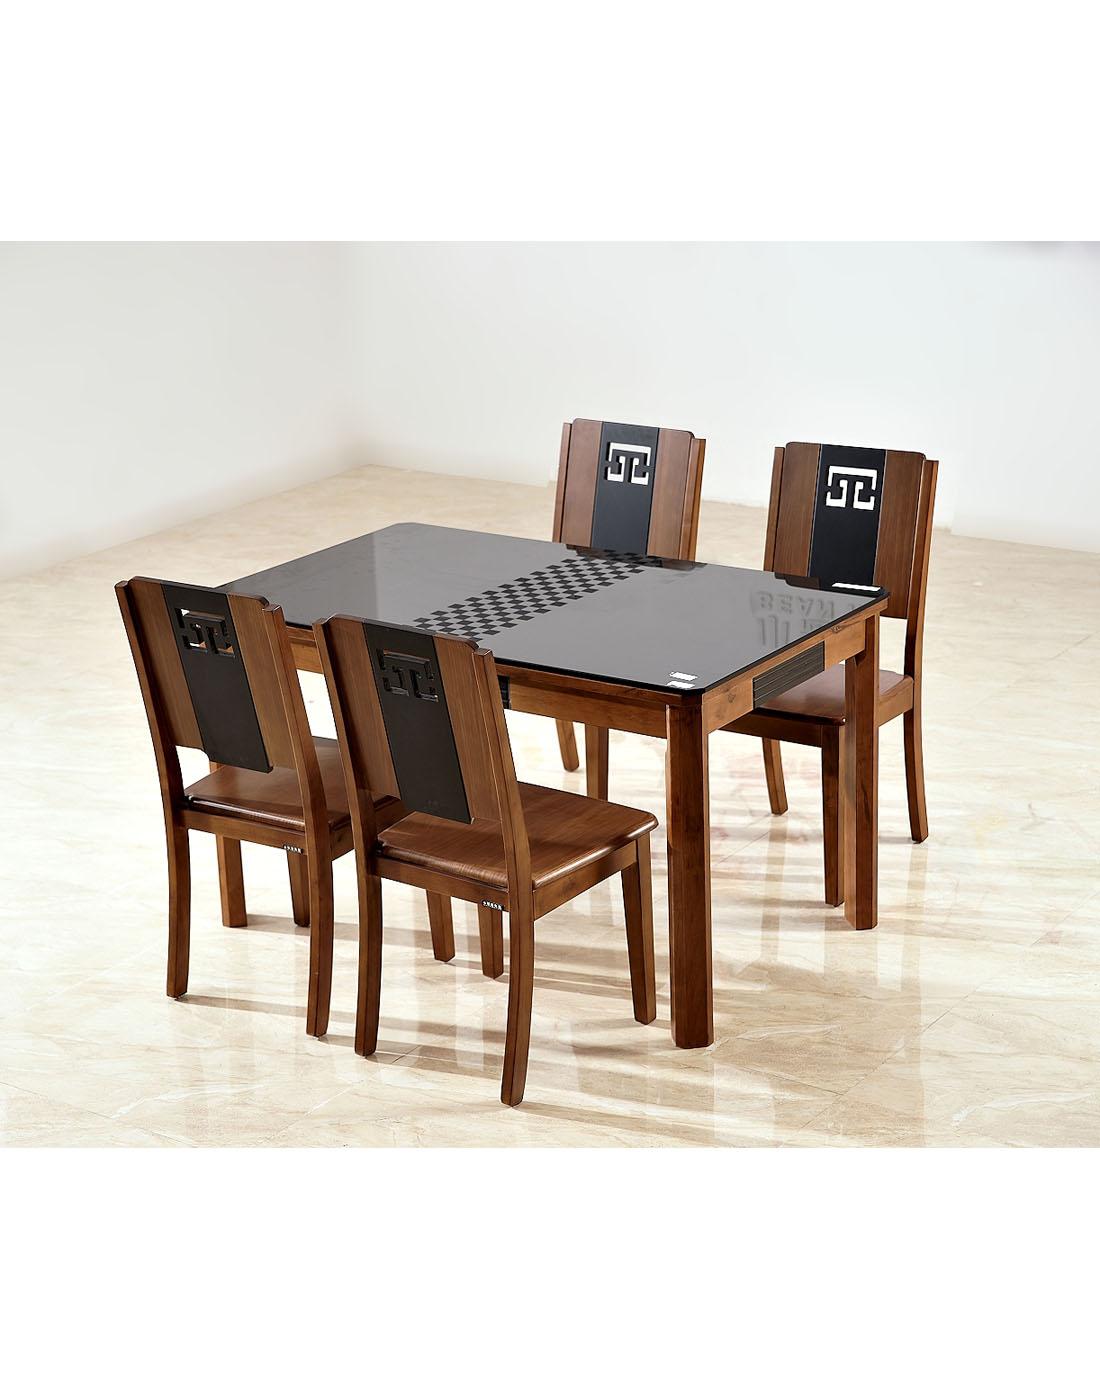 homes家具实木中式餐桌椅(一桌四椅)xhd